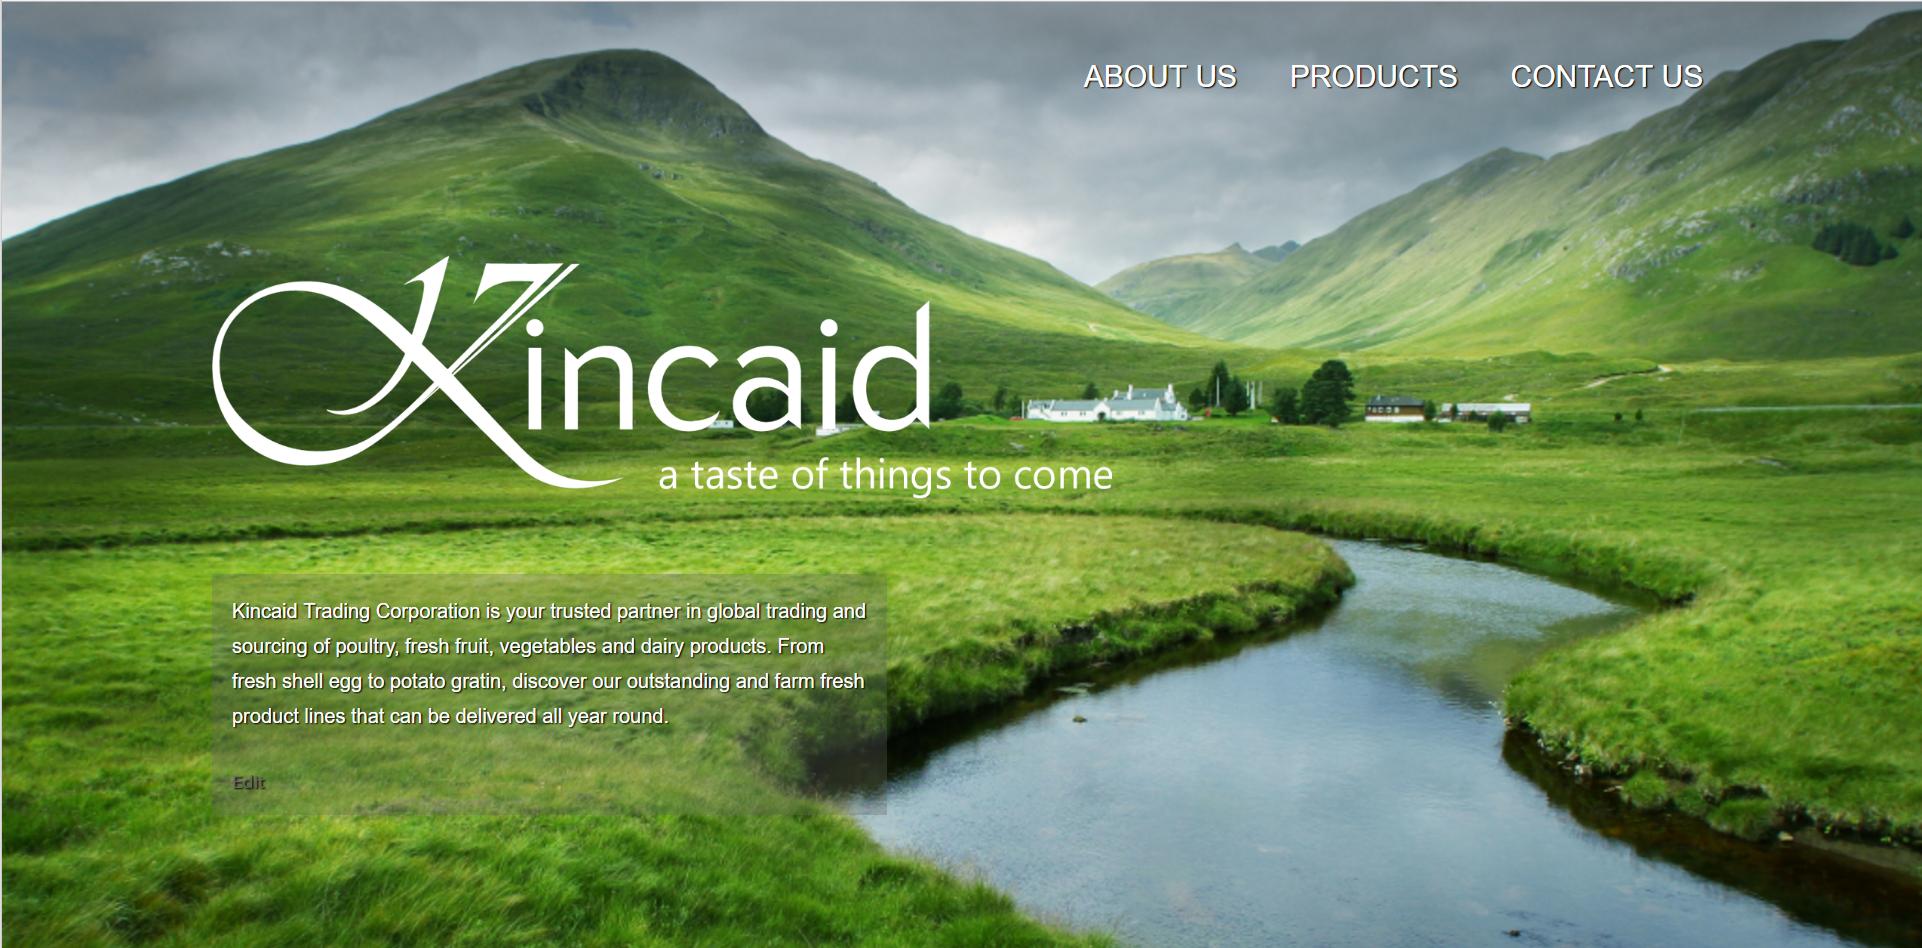 Kincaid Trading